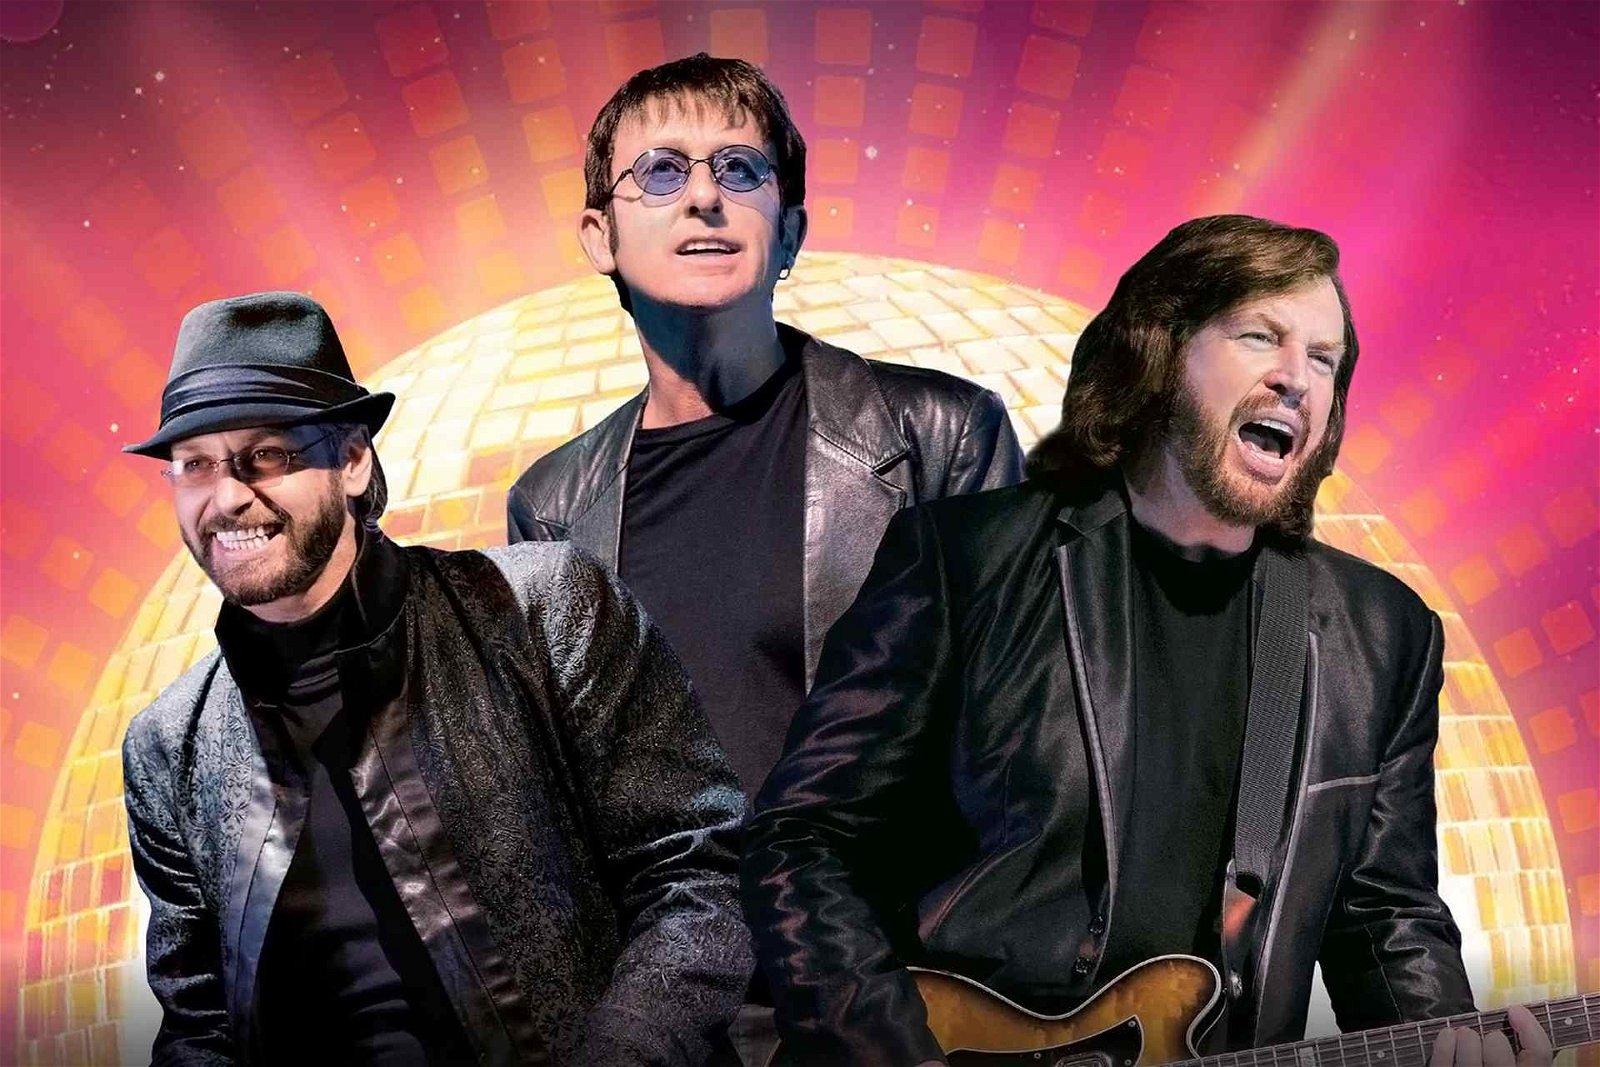 The Australian Bee Gees